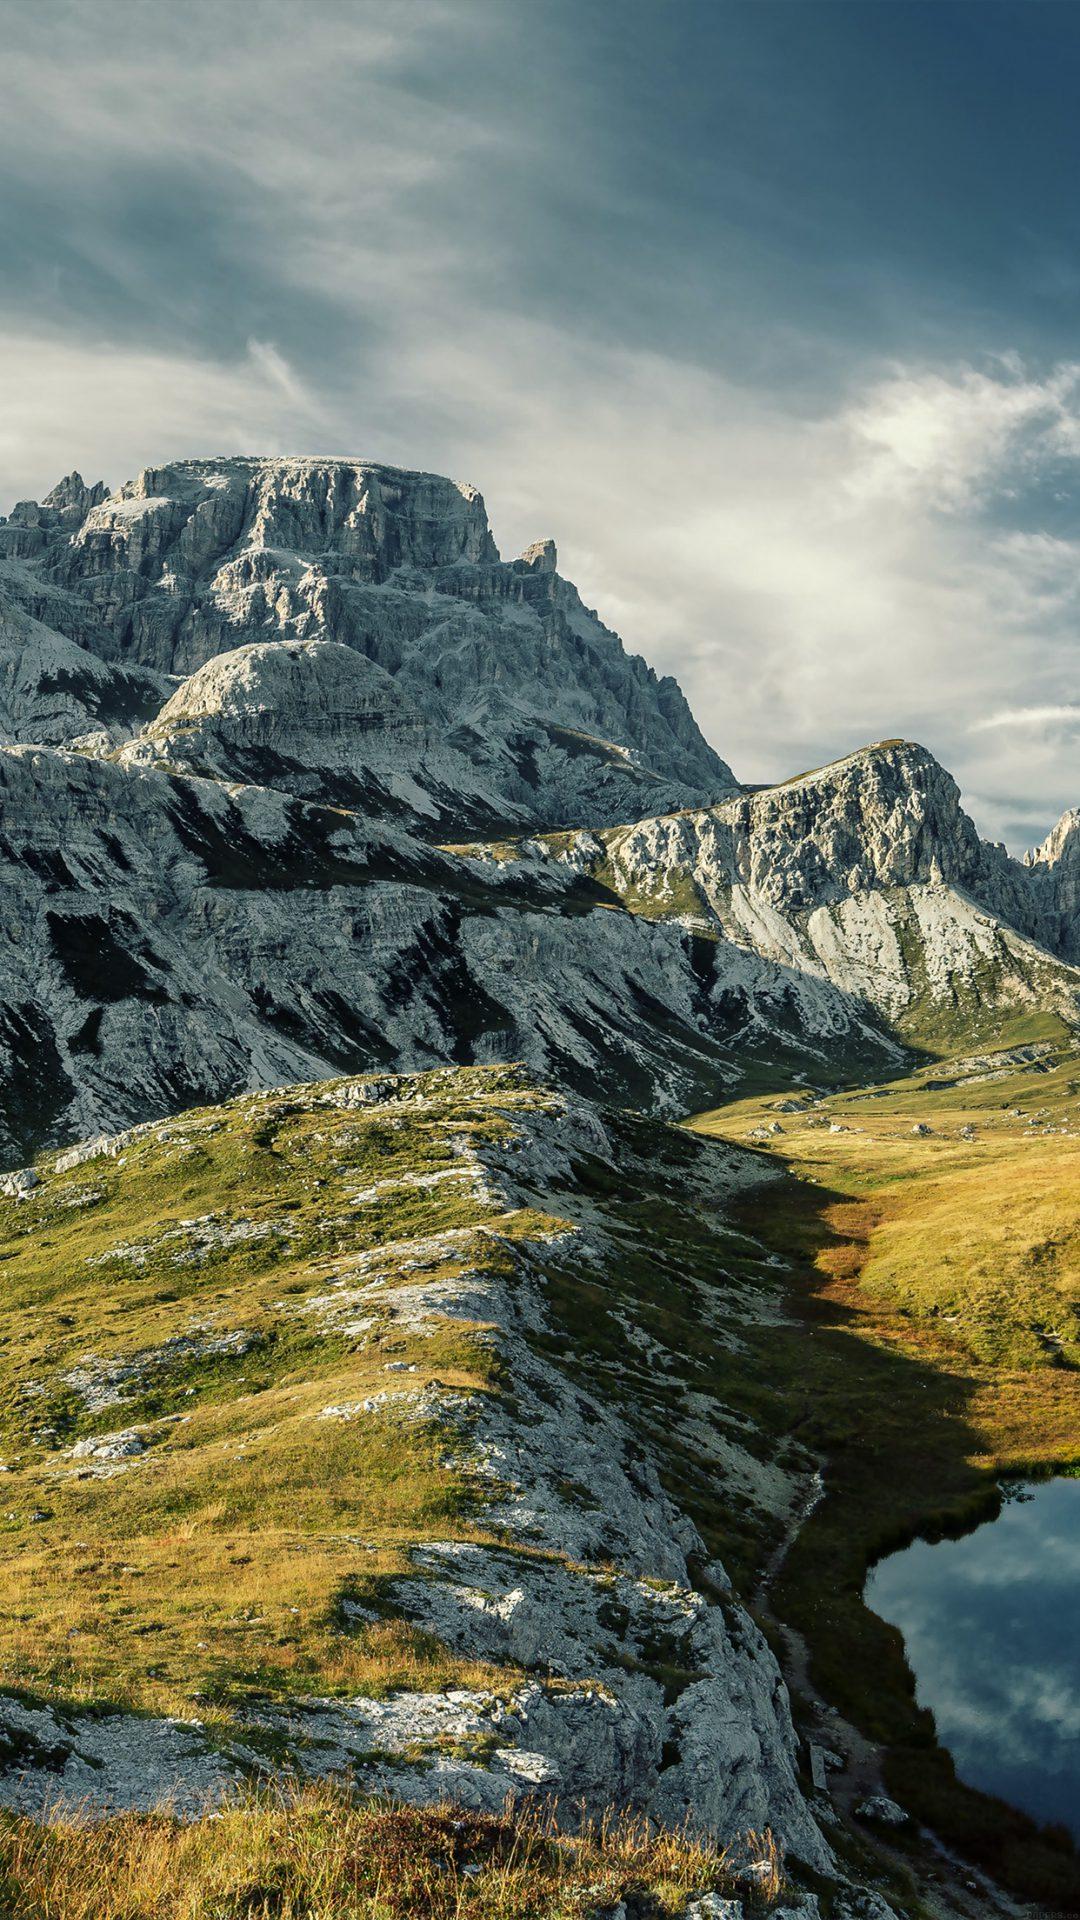 Apple 5k Imac High Mountain Nature